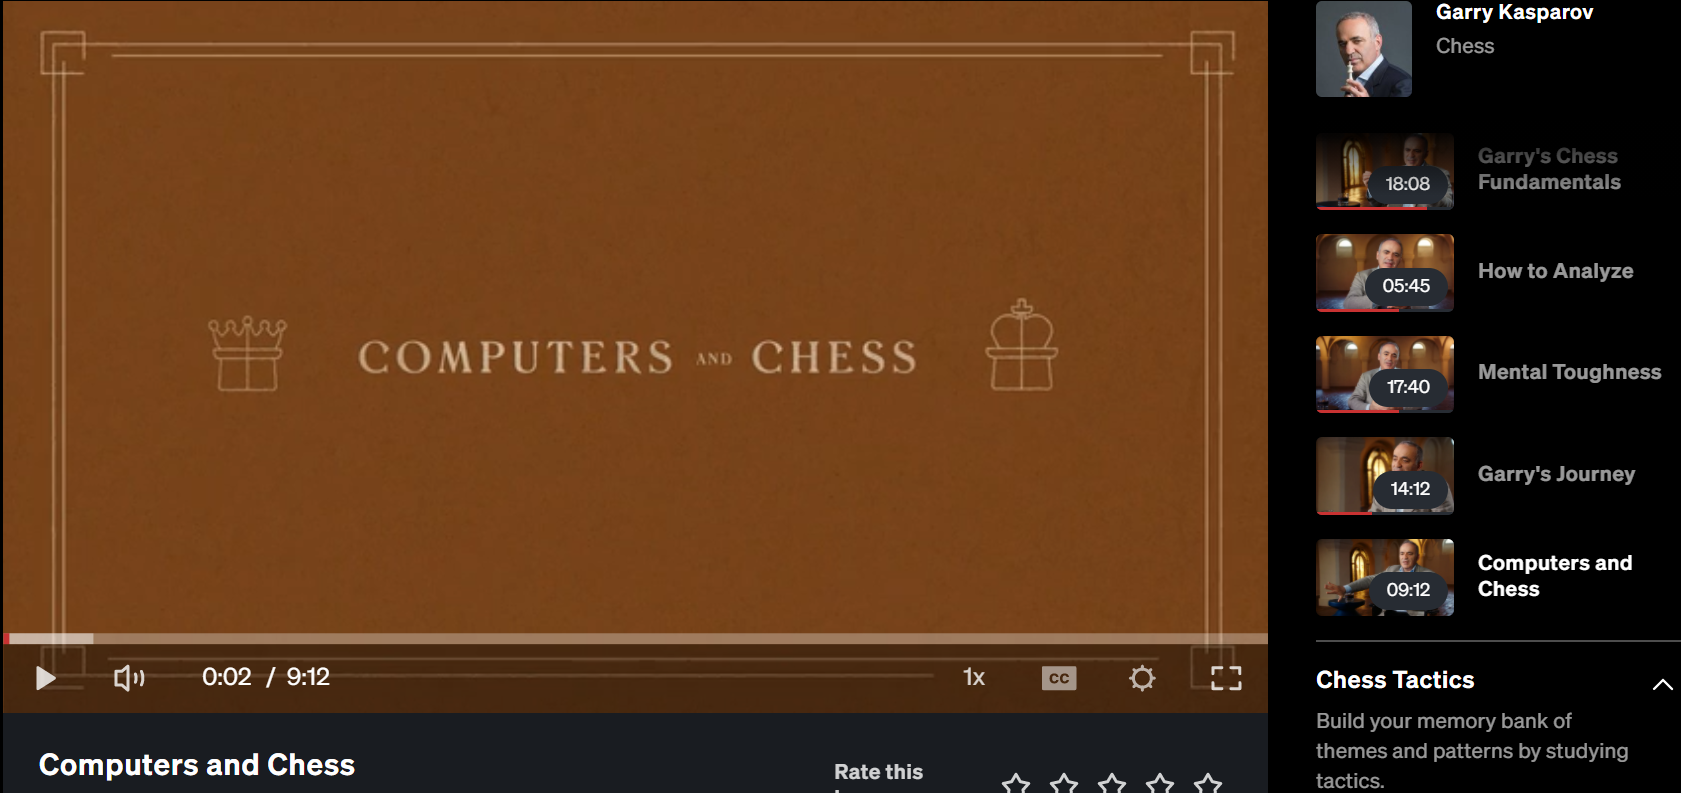 garry casparov computer vs chess